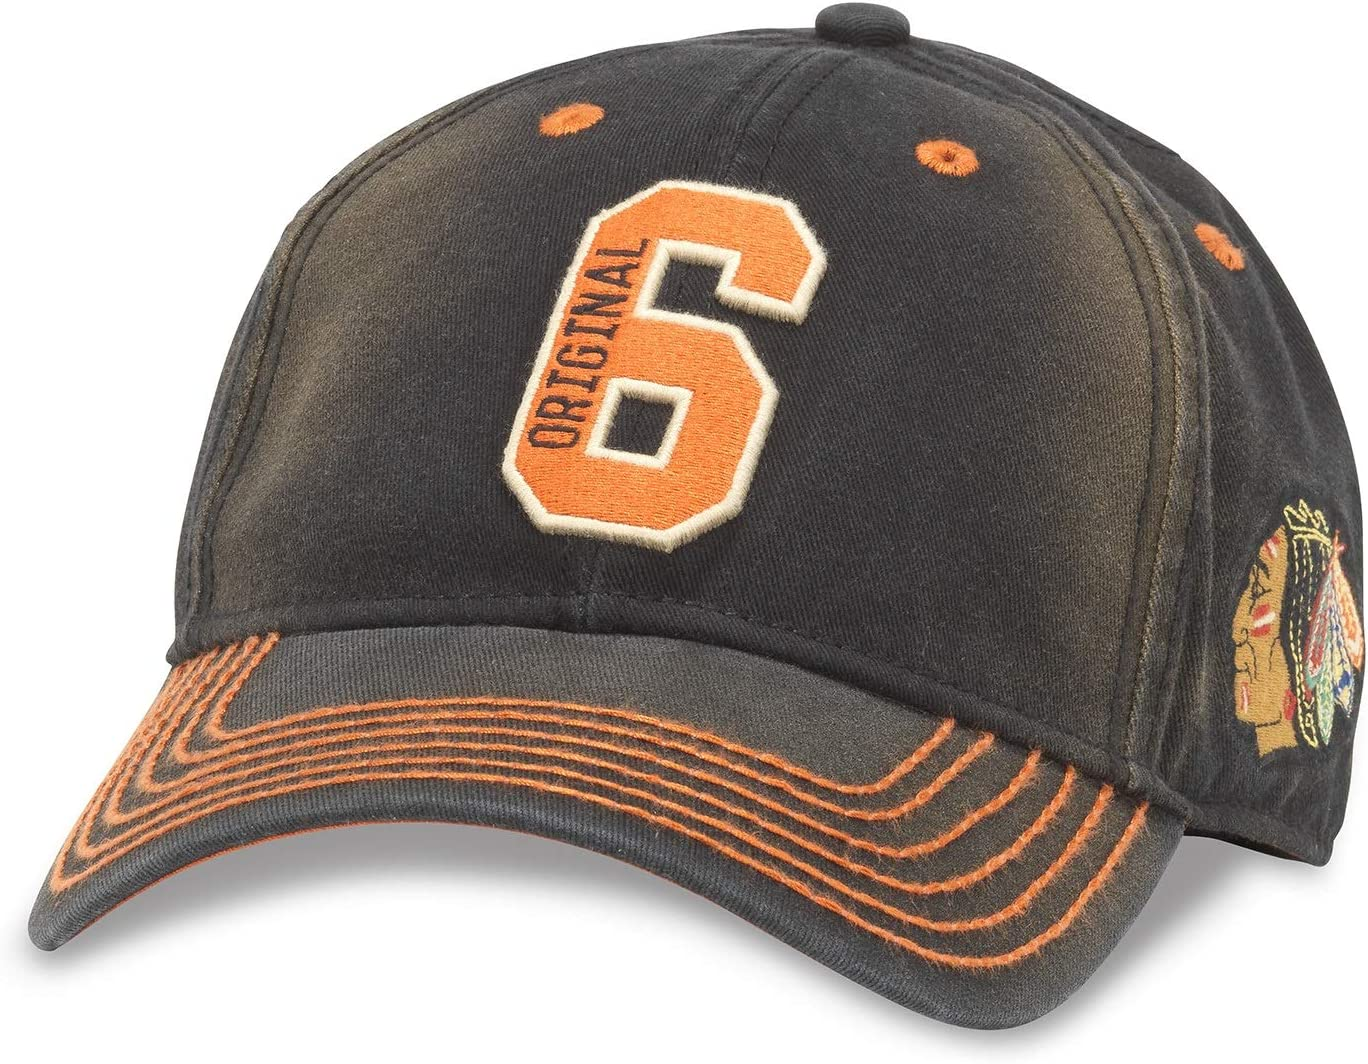 American Needle NHL オリジナル 6チーム U2 スクエア アンティーク調 ウォッシュ加工 調節可能な帽子